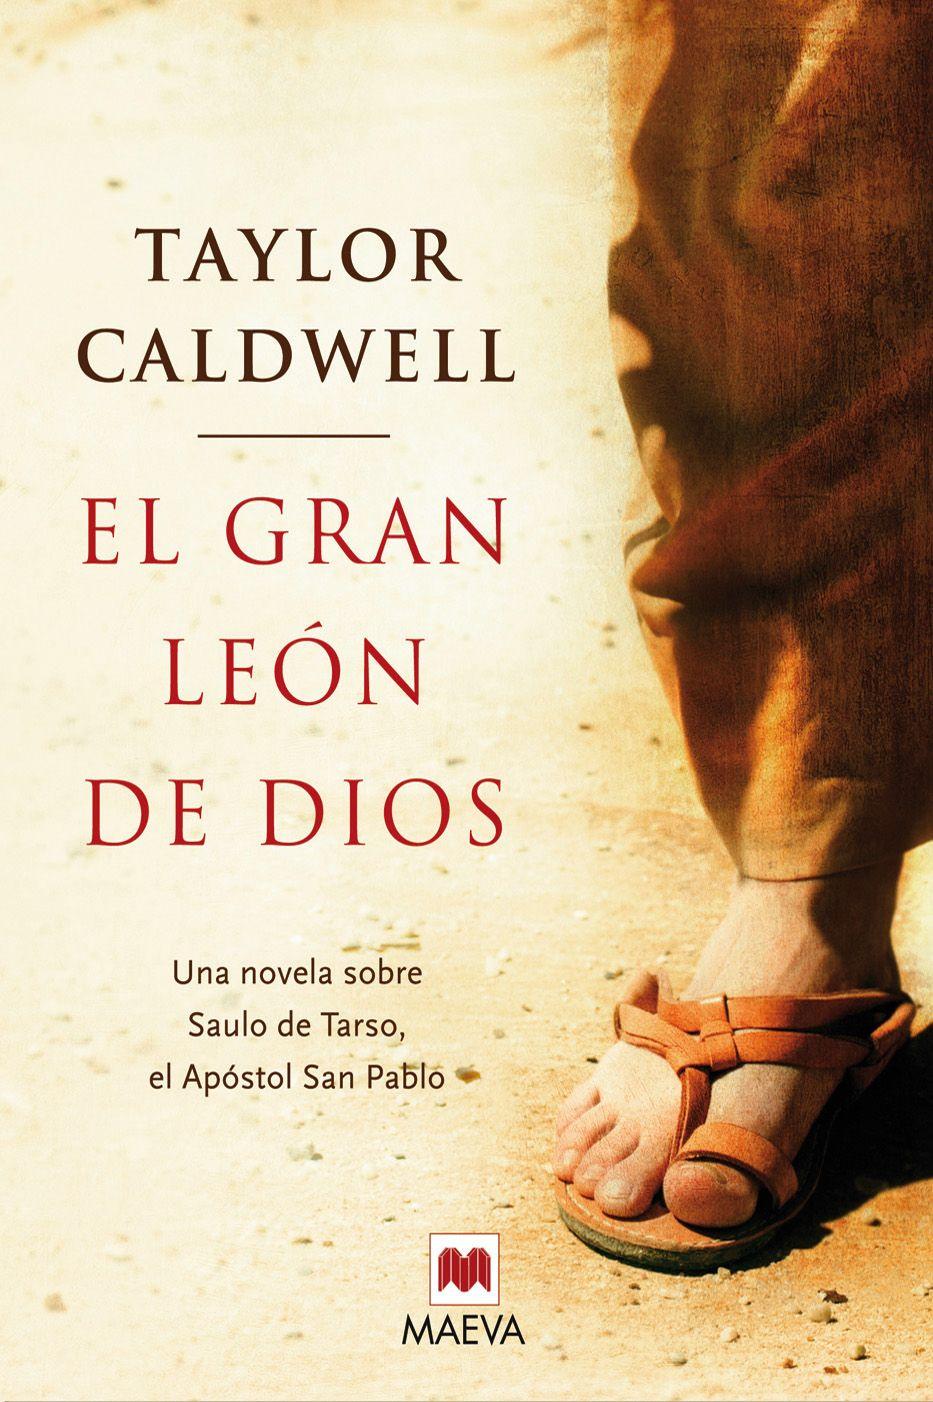 Esta novela inspirada en la vida de san Pablo nos acerca